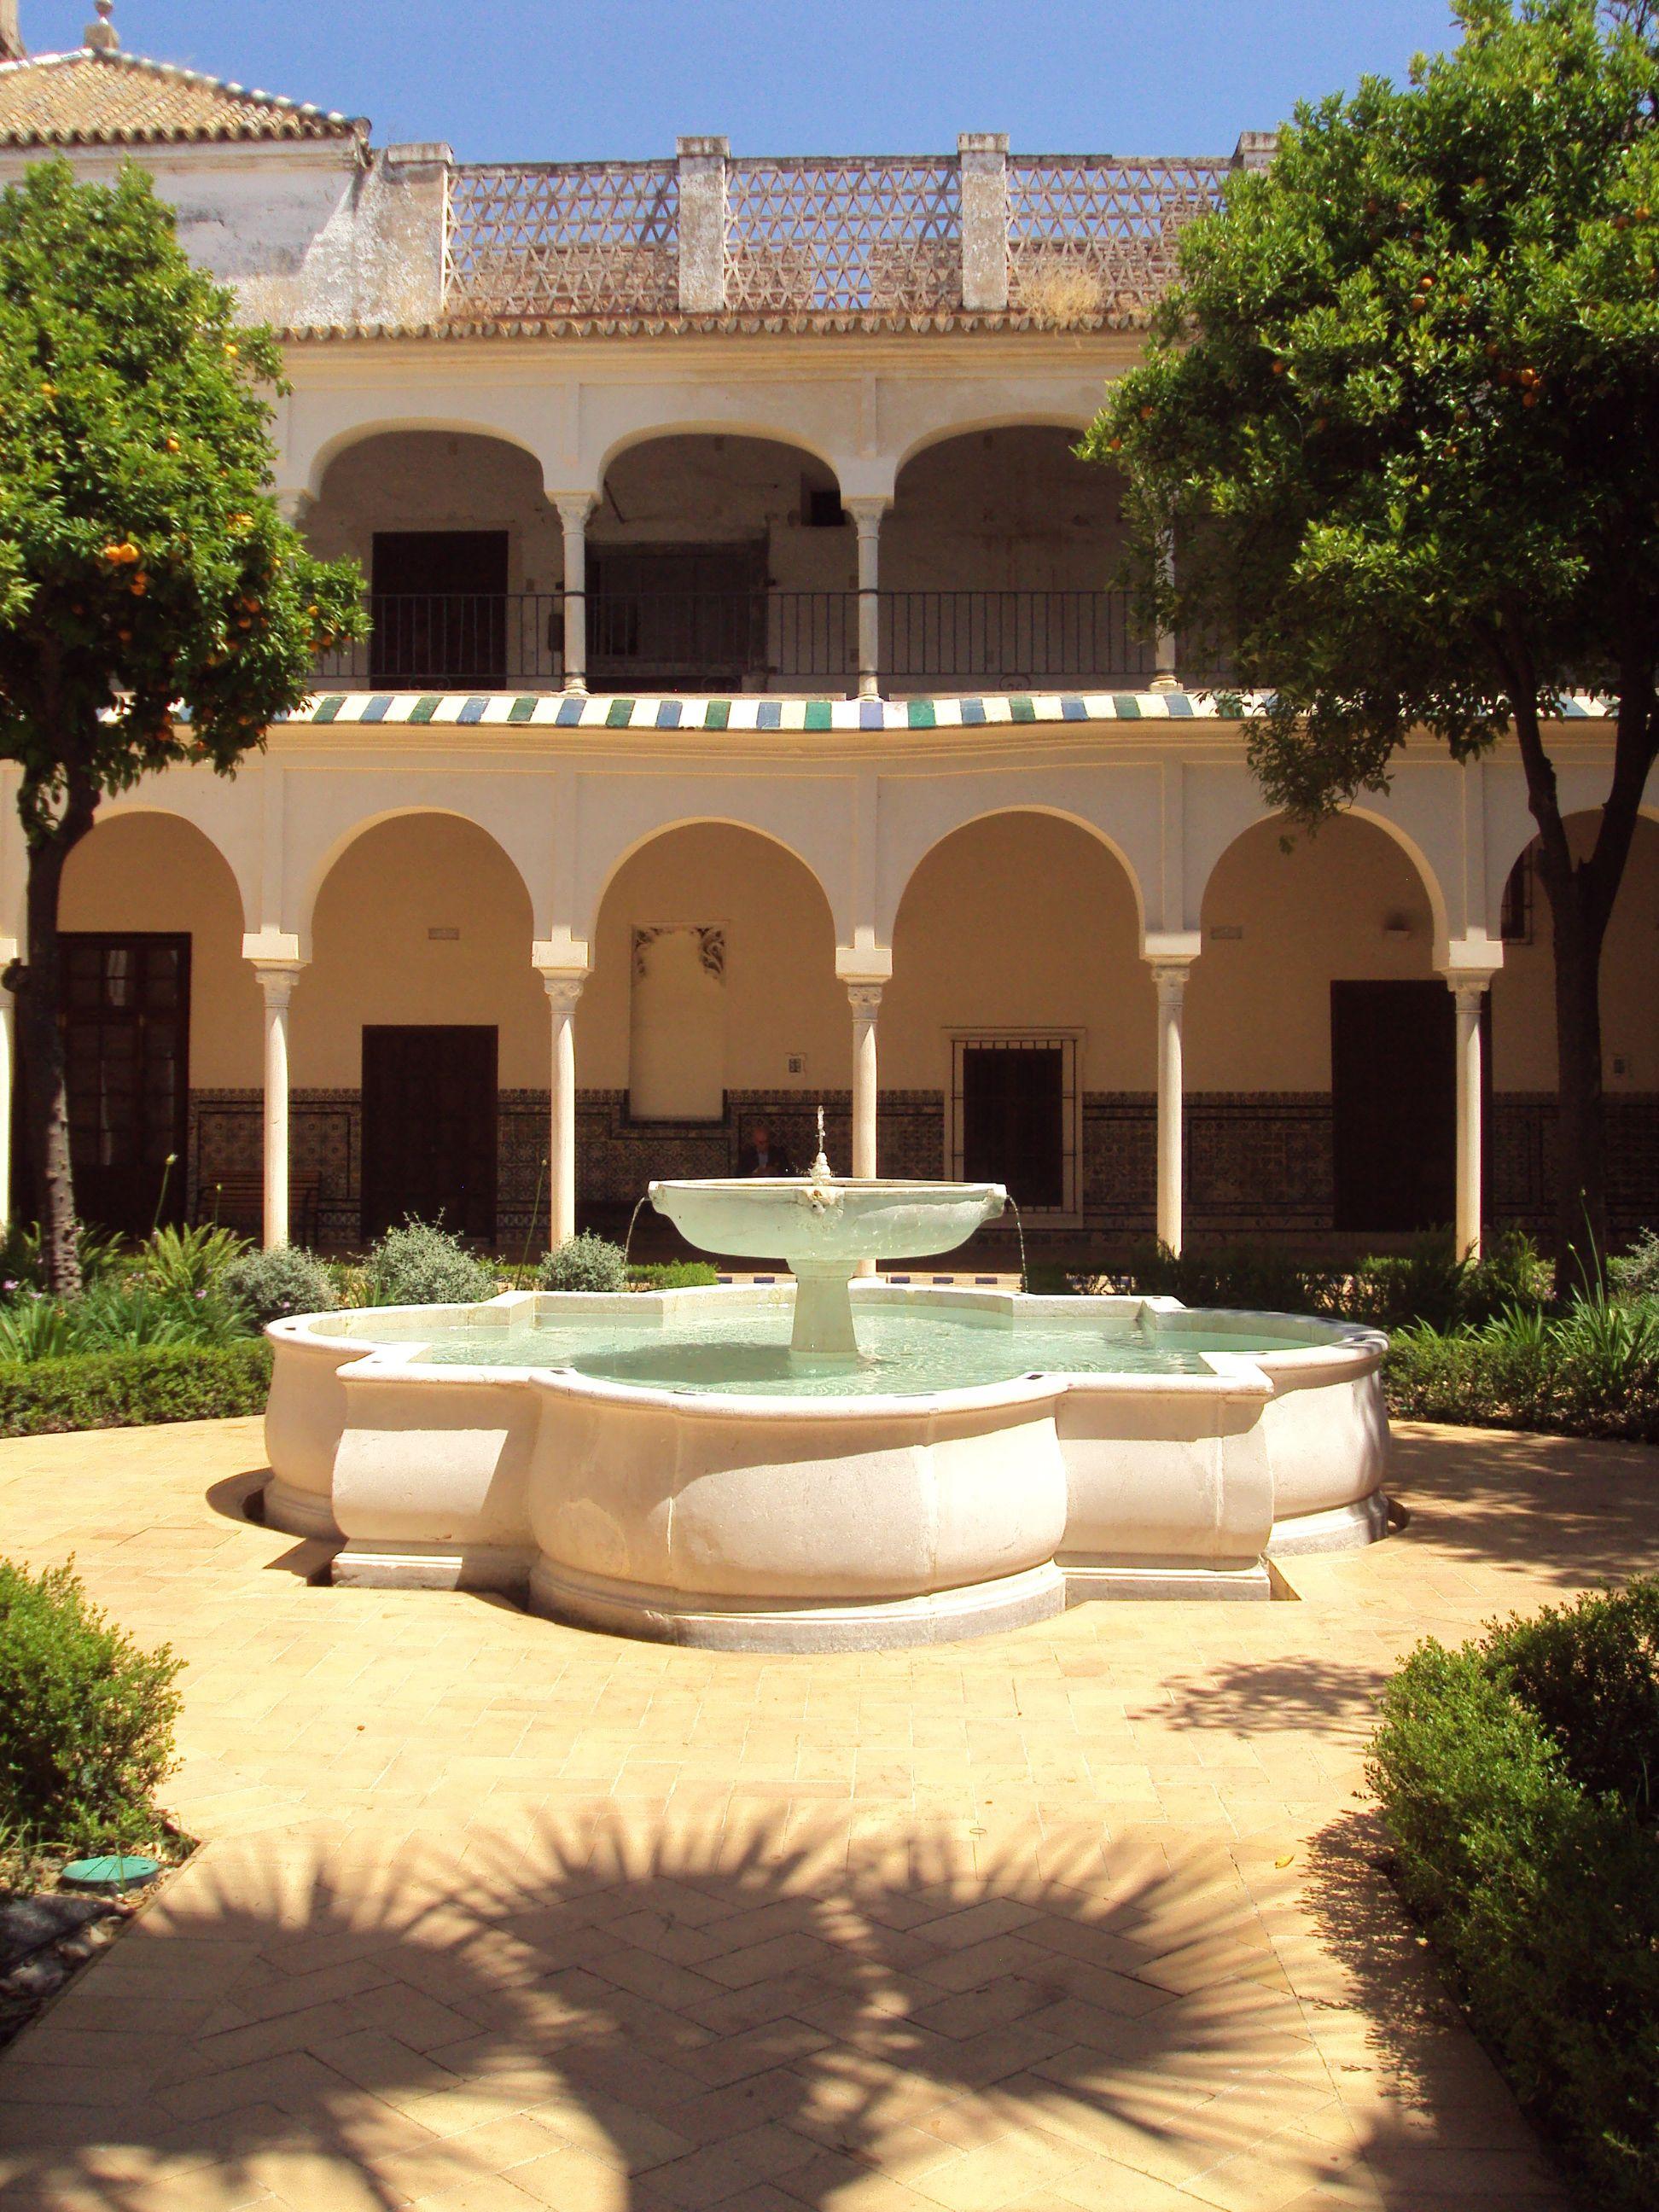 Patio convento de santa clara en 2019 sevilla espa a - Casas en santa clara sevilla ...